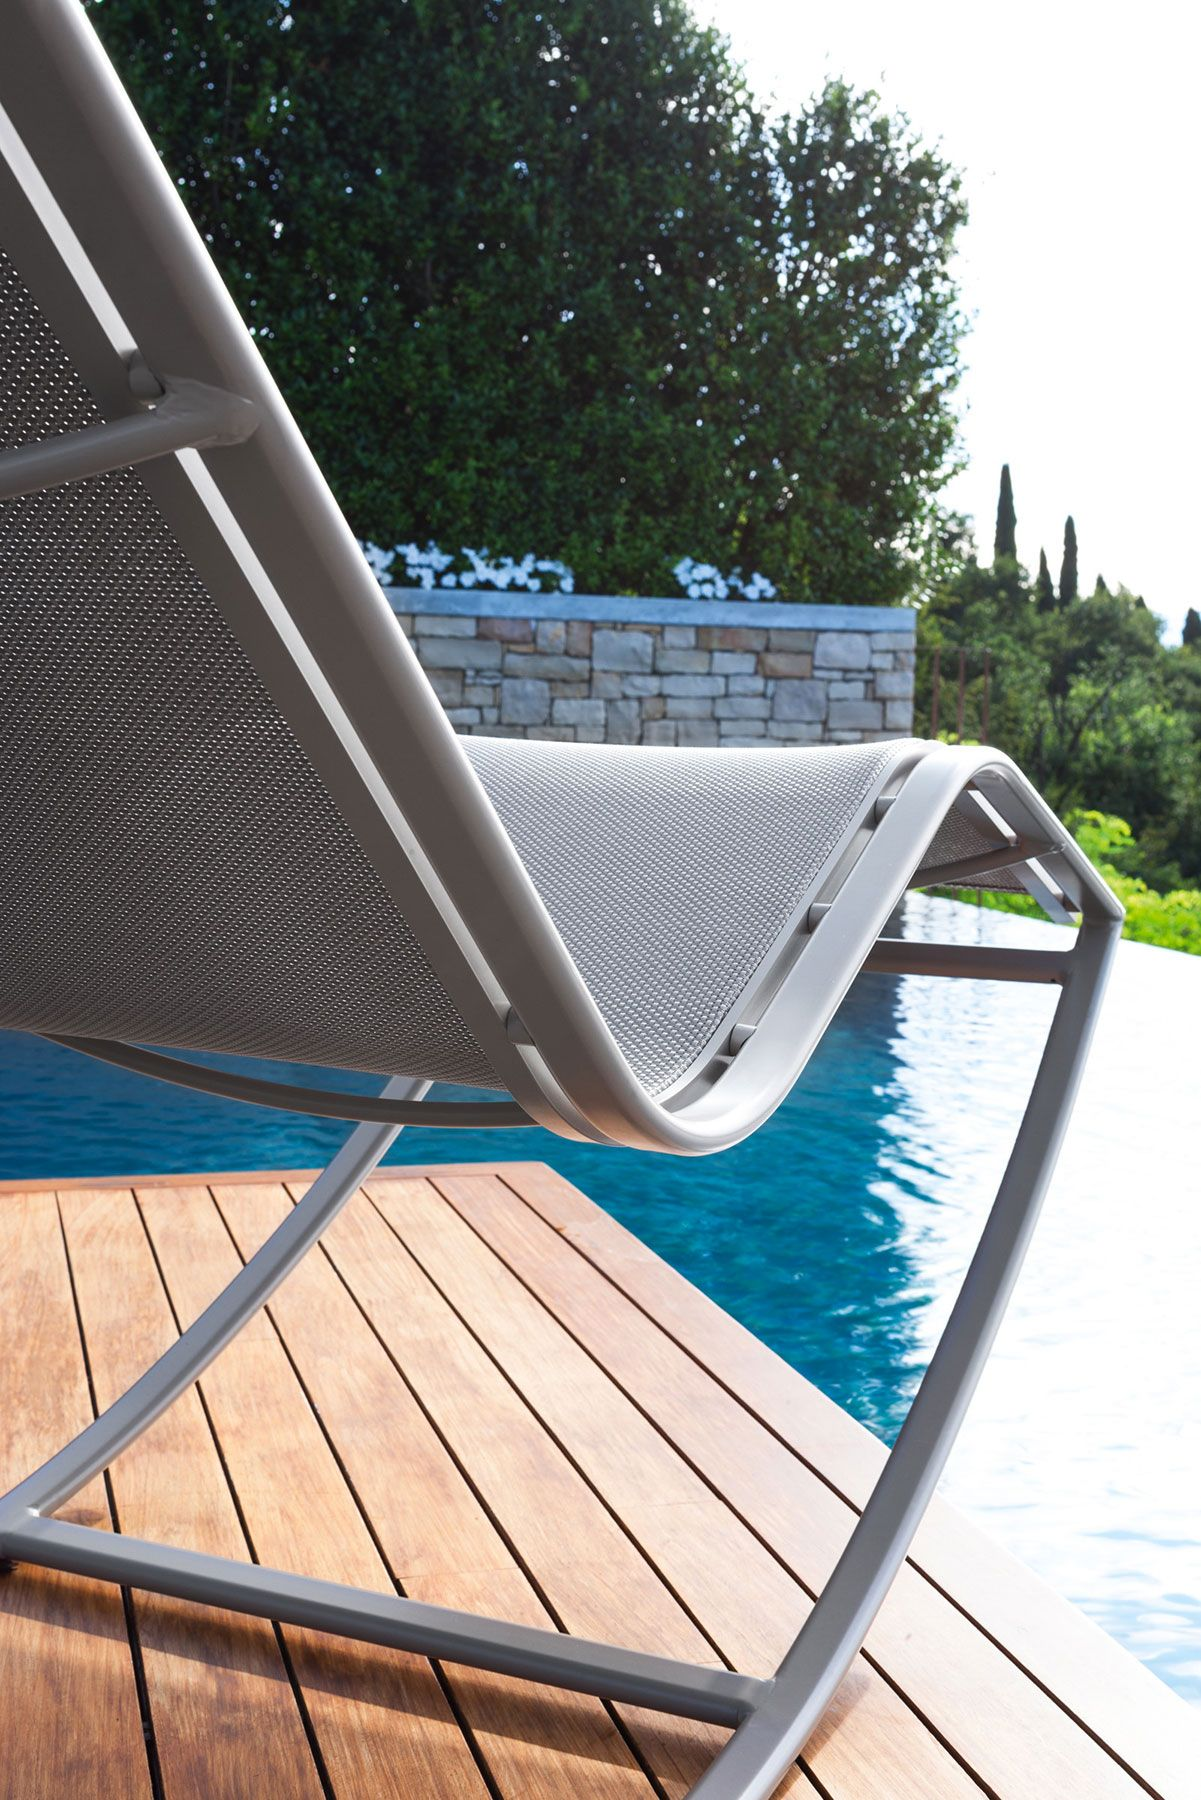 lounger rocking sunbed chair outdoor pool side garden terrace, Wohnzimmer dekoo